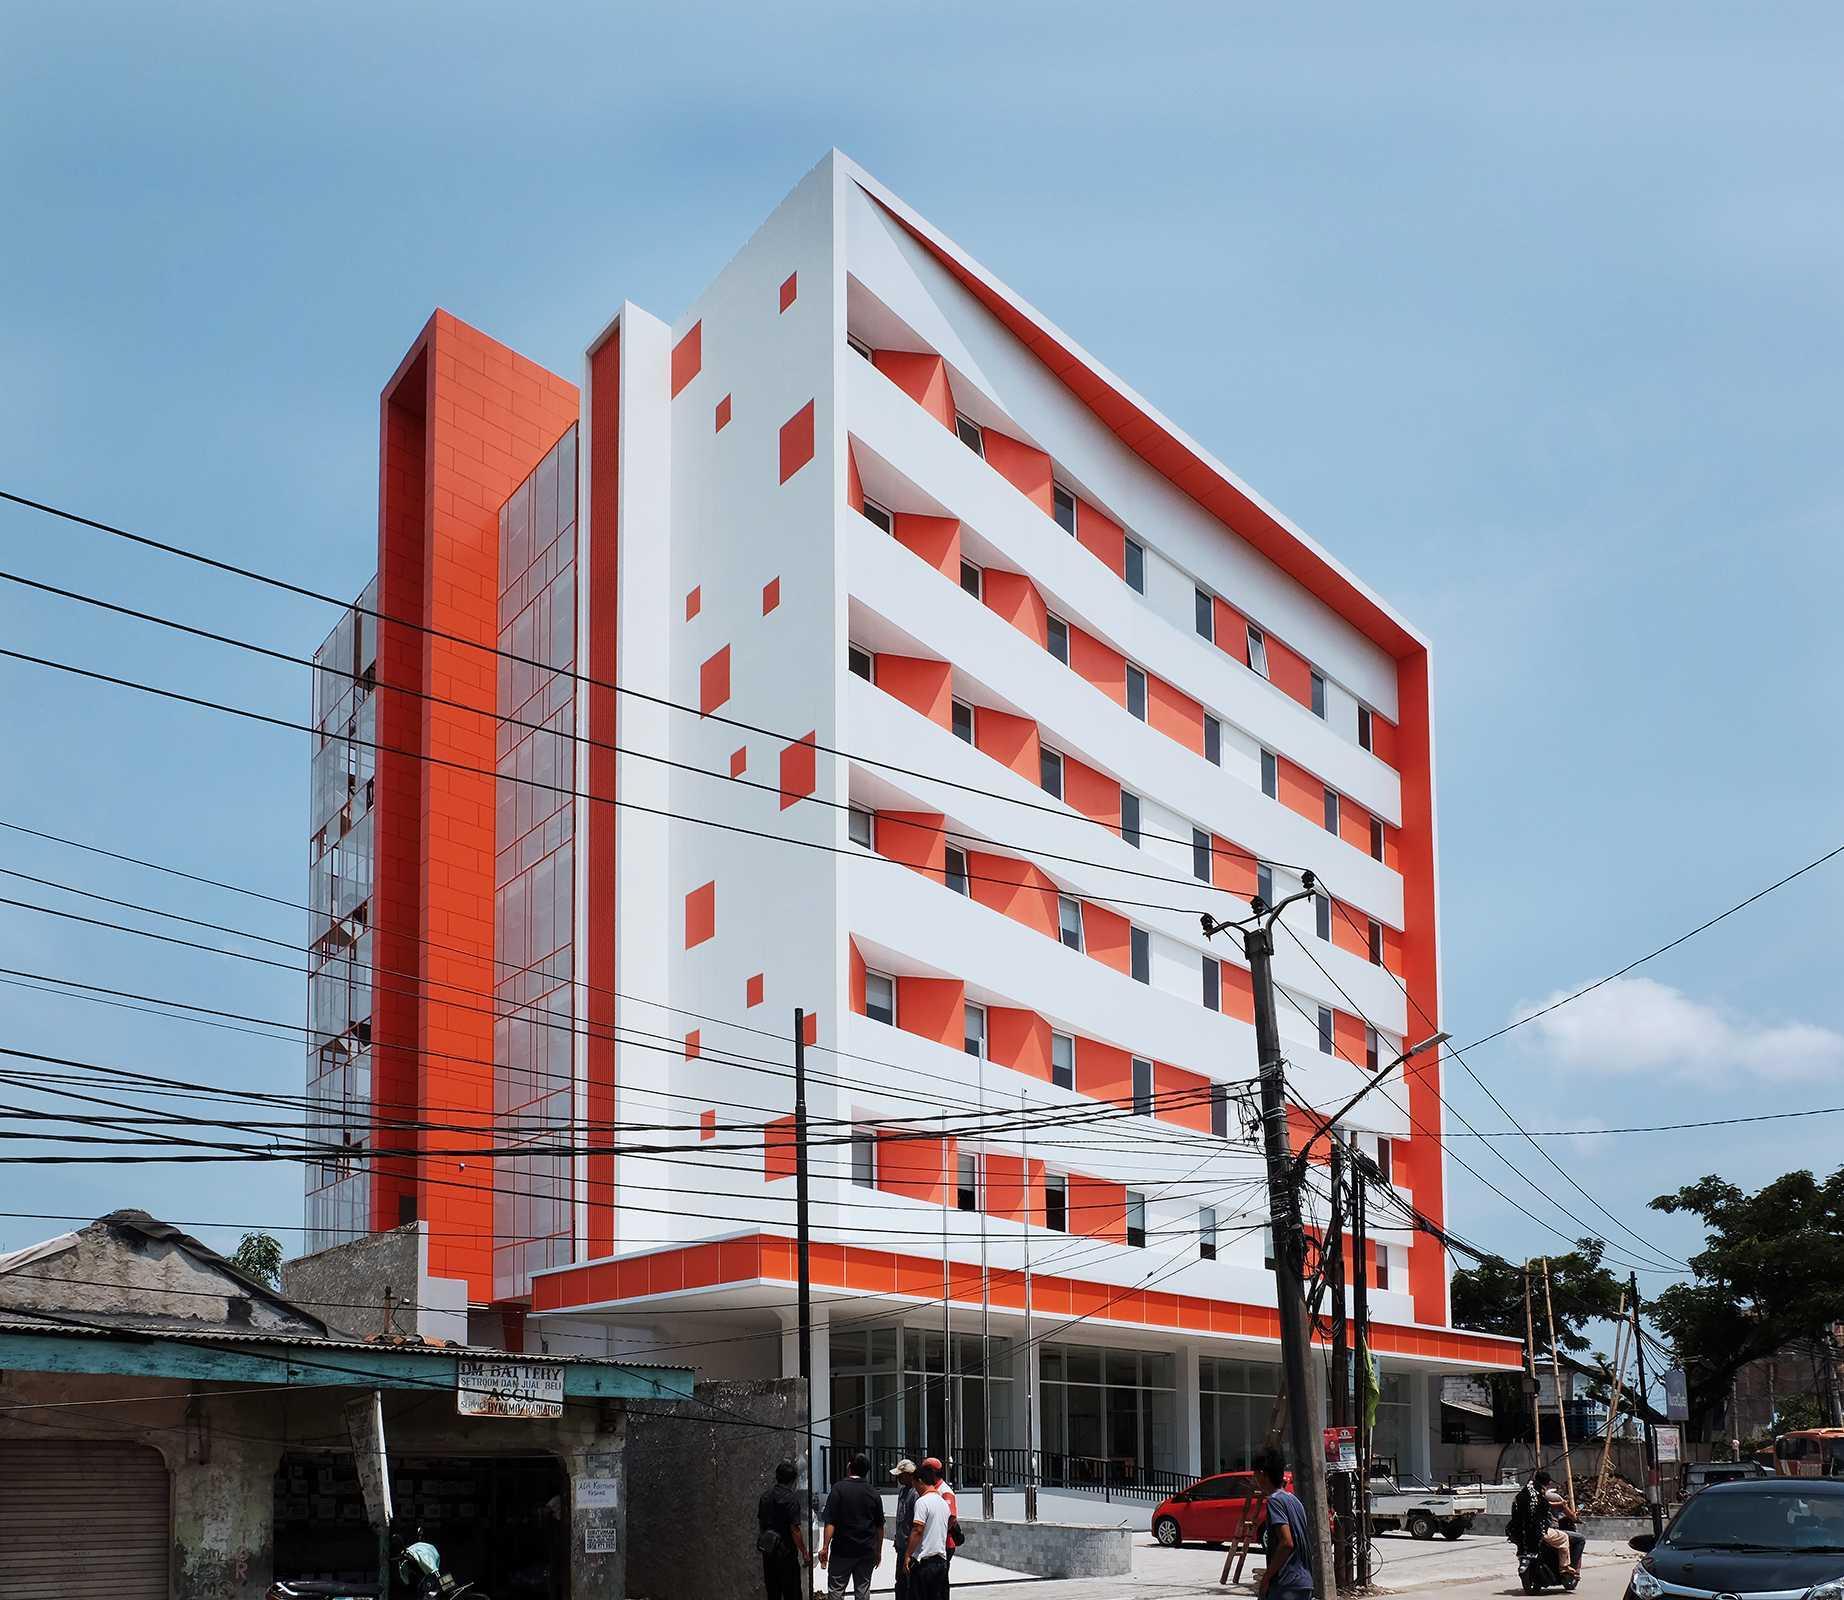 Xoa Design Starlet Hotel Cengkareng Jl. Atang Sanjaya, Benda, Kota Tangerang, Banten 15125, Indonesia Jl. Atang Sanjaya, Benda, Kota Tangerang, Banten 15125, Indonesia Xoa-Design-Starlet-Hotel-Cengkareng   73421